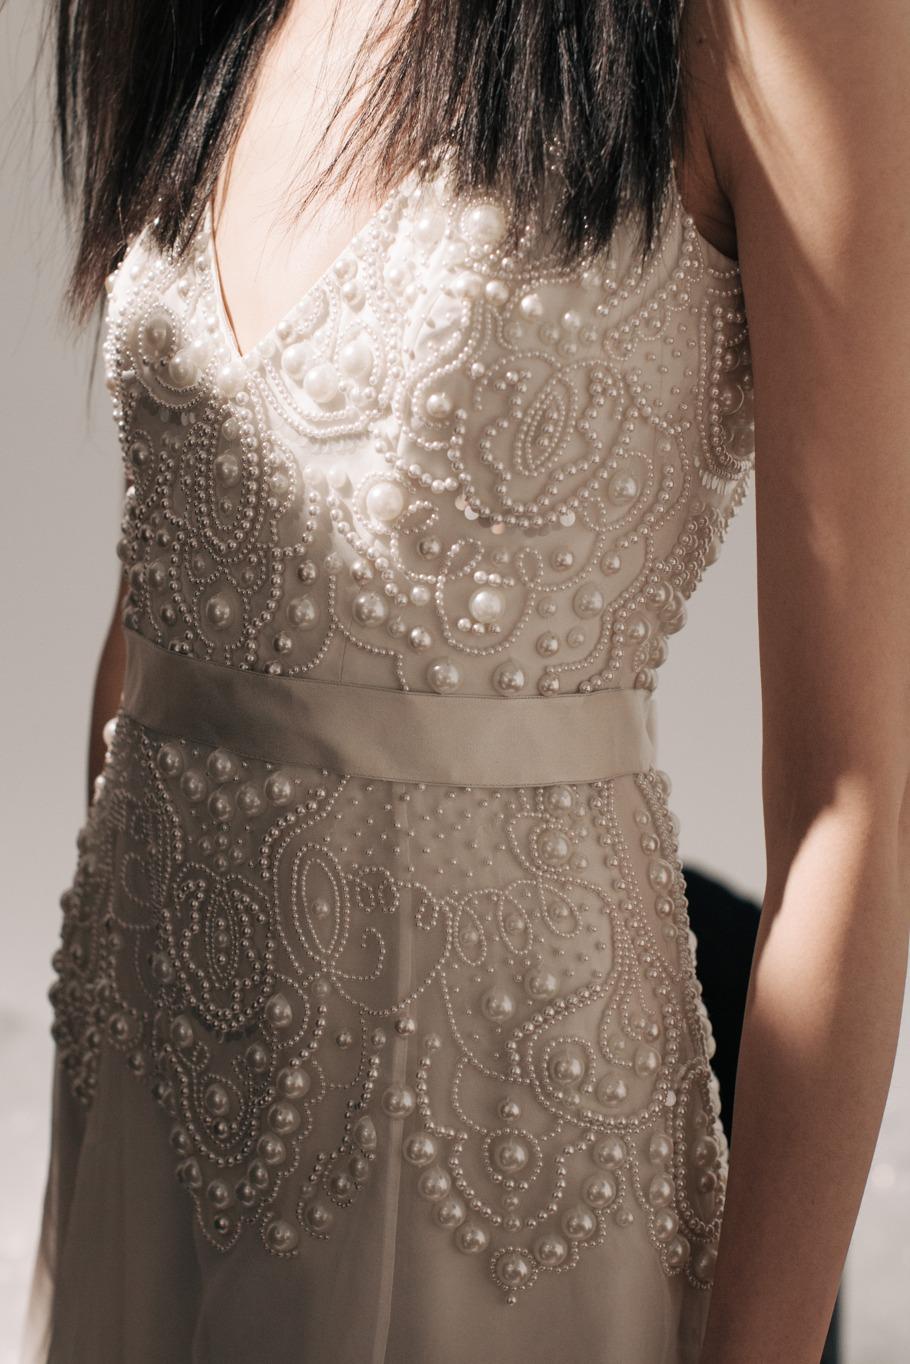 01-Jenny Packham Bridal-This Is Glamorous.jpg